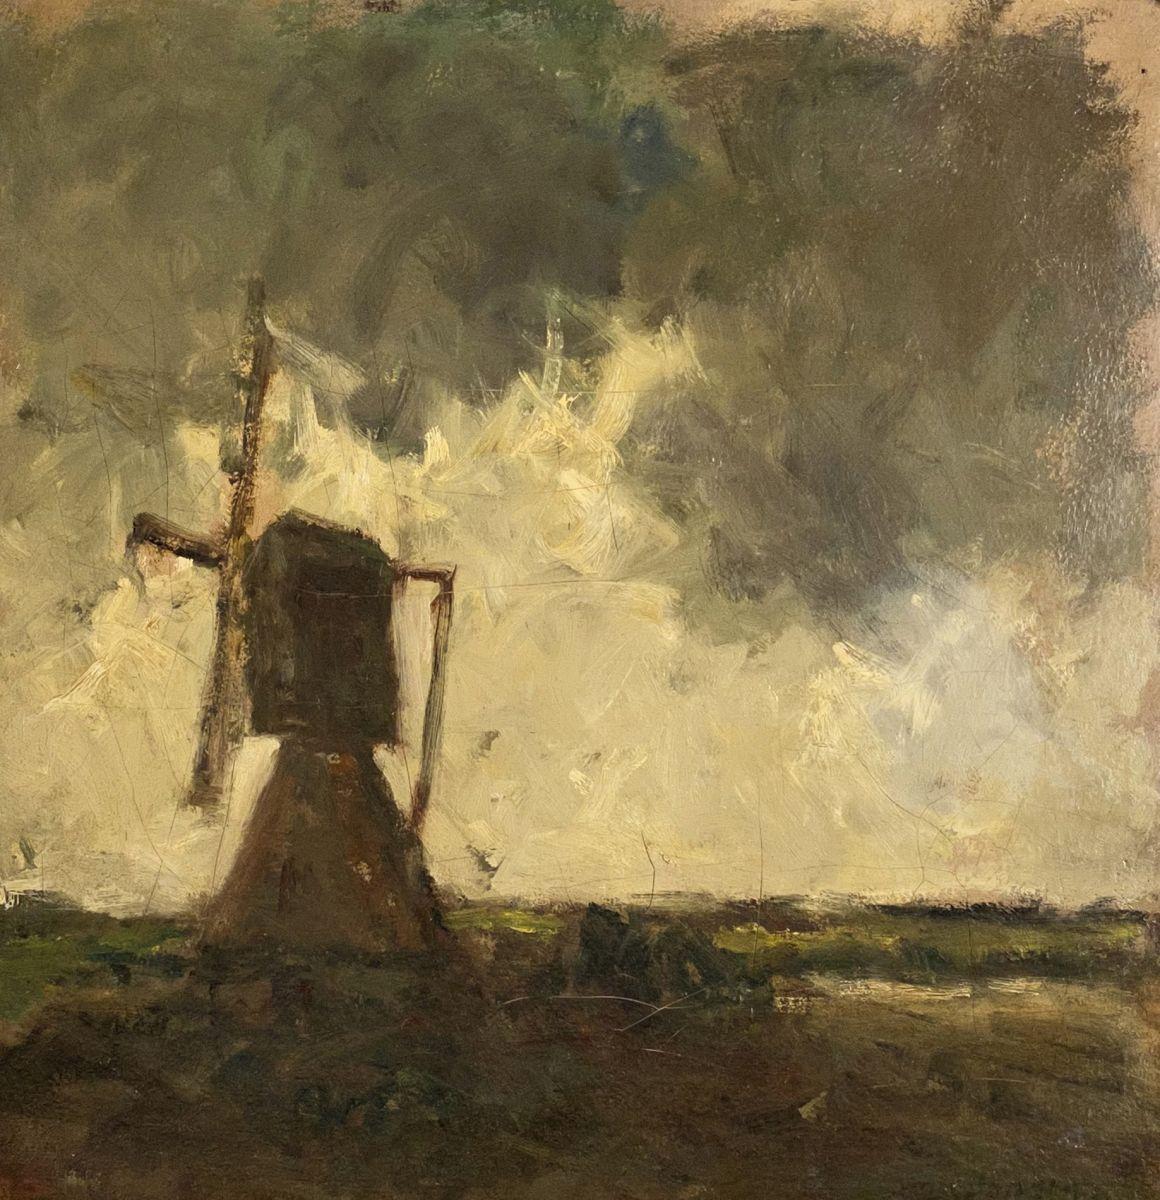 Lot 224, Windmill in a landscape, 1895, Oil on canvas; Estimate $60,000-$80,000